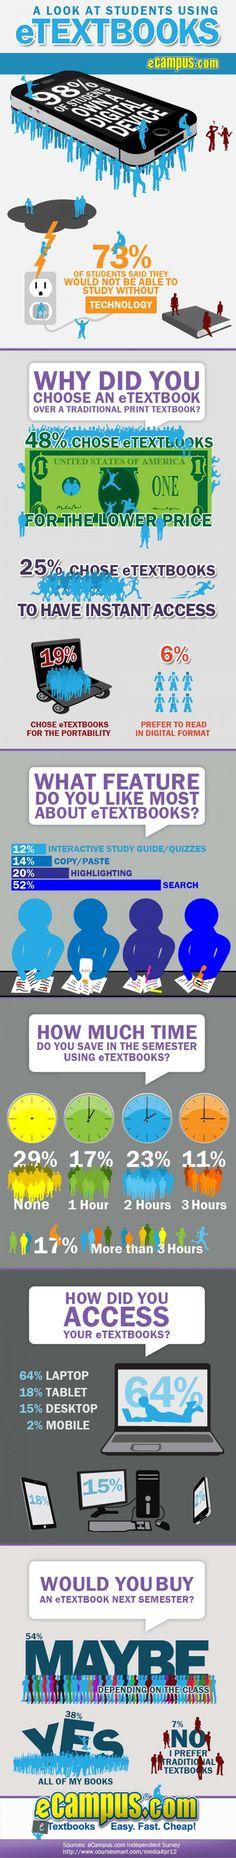 E-books vs. Print [Infographic]   #education #technology #etextbooks